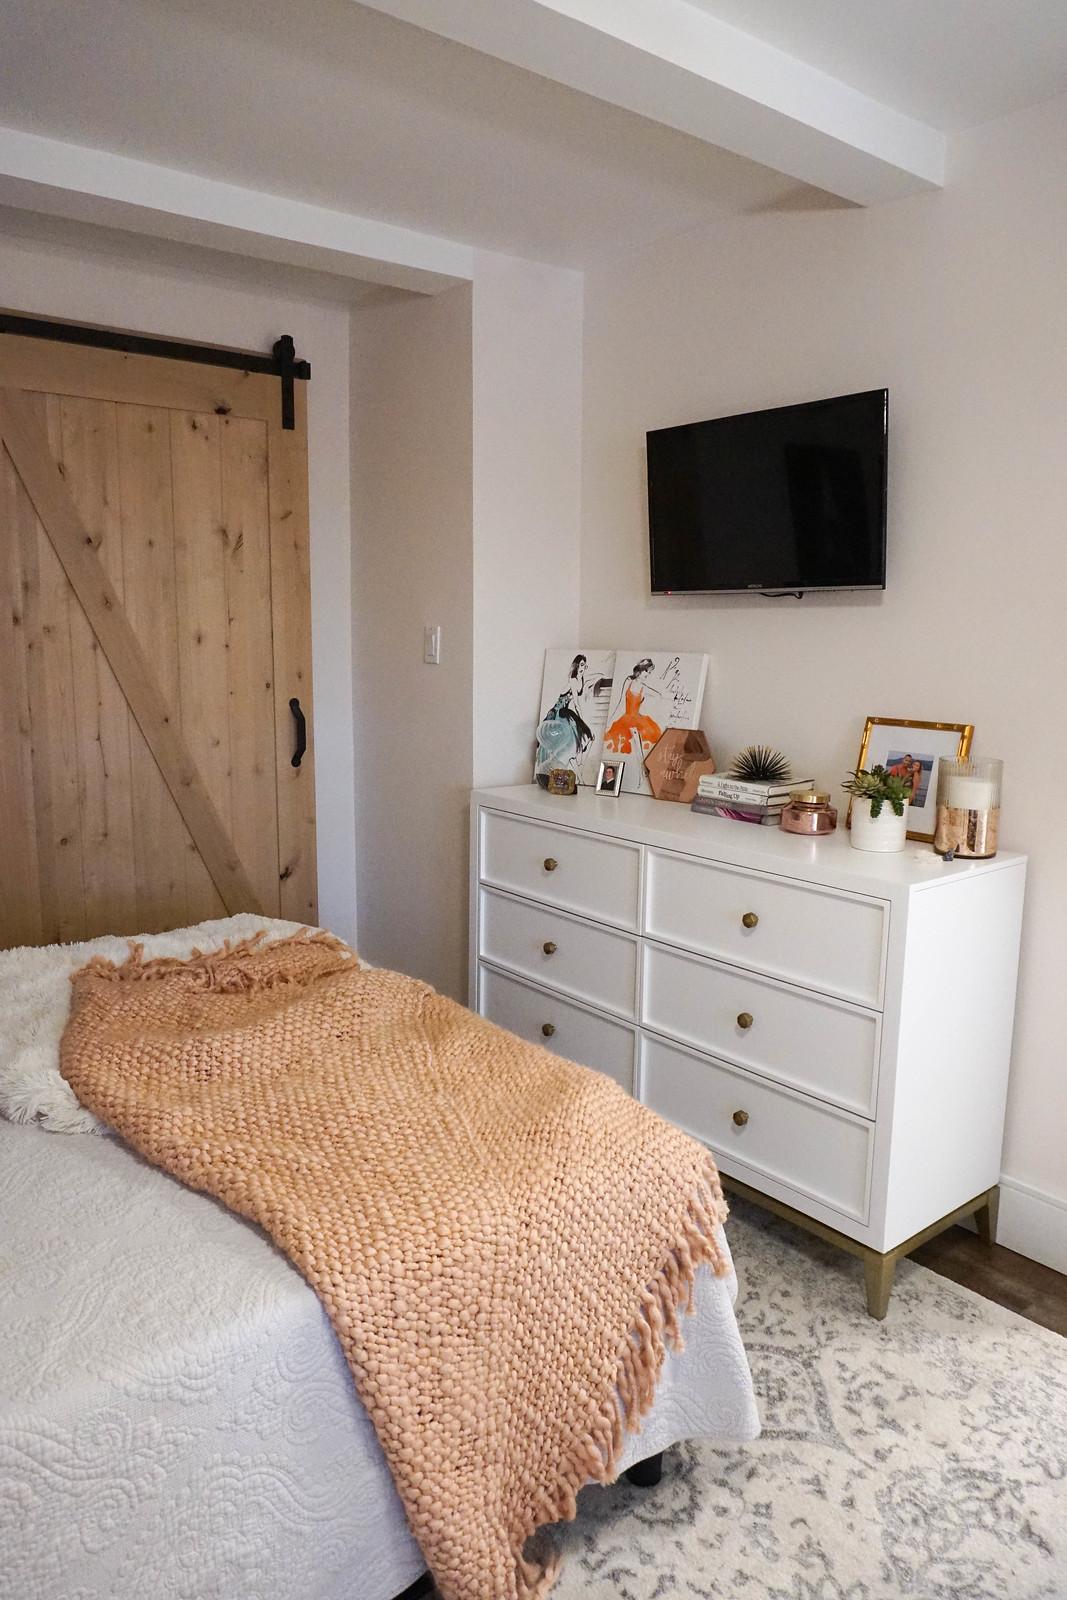 Rachael Ray Home Chelsea 6 Drawer Double Dresser